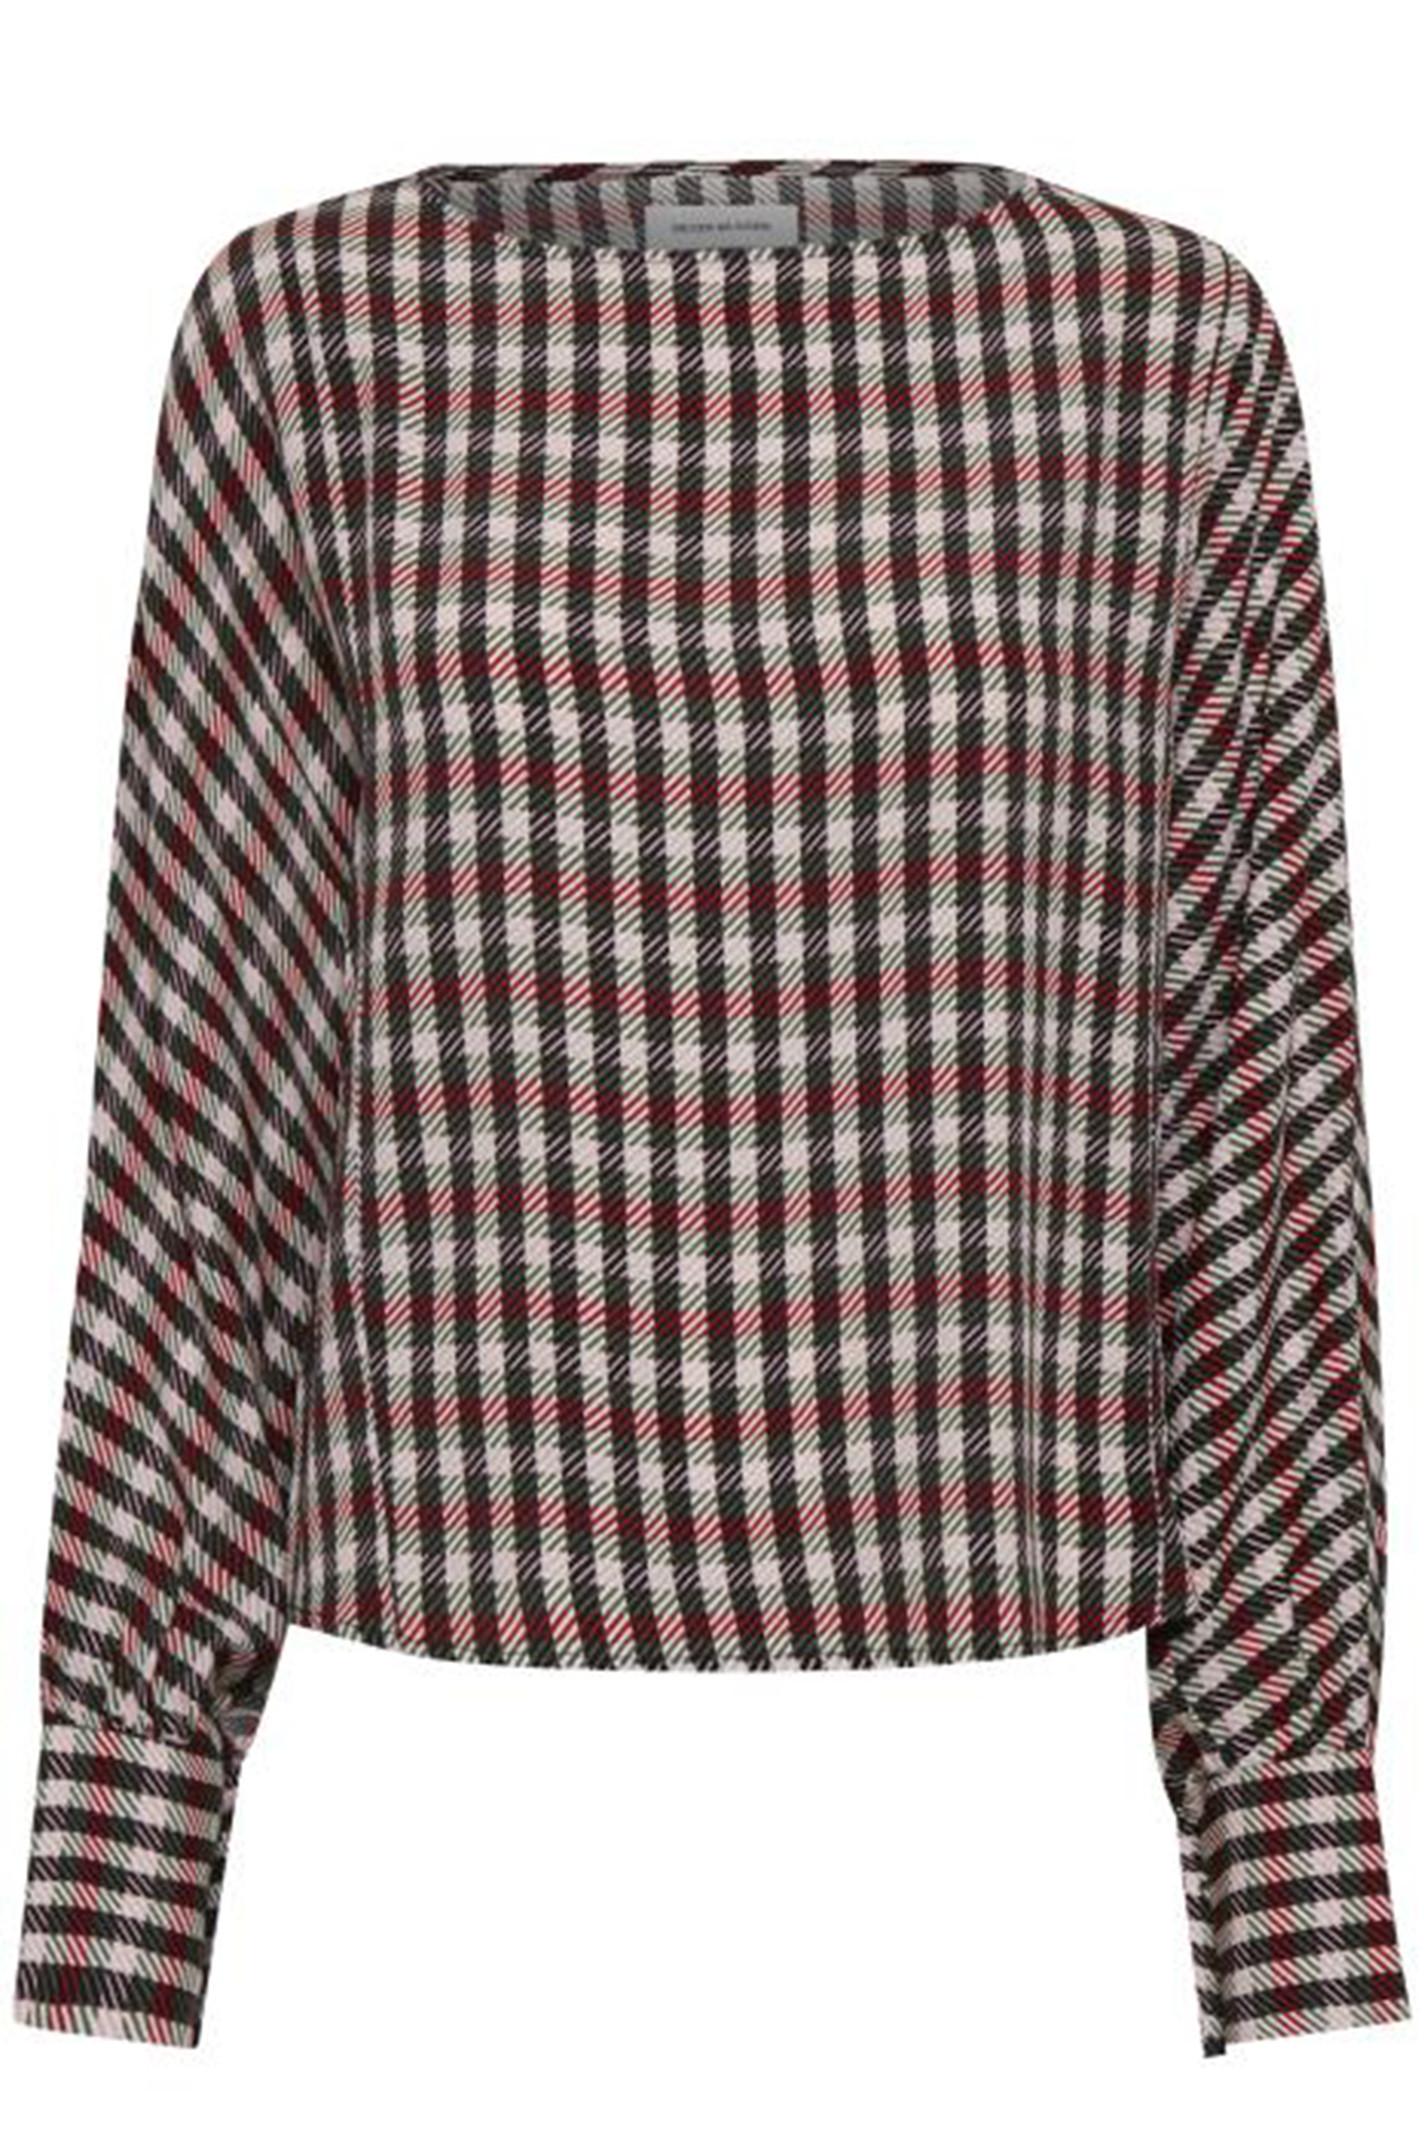 DENIM HUNTER 10702772 Lola Batsleeve blouse Multi colour